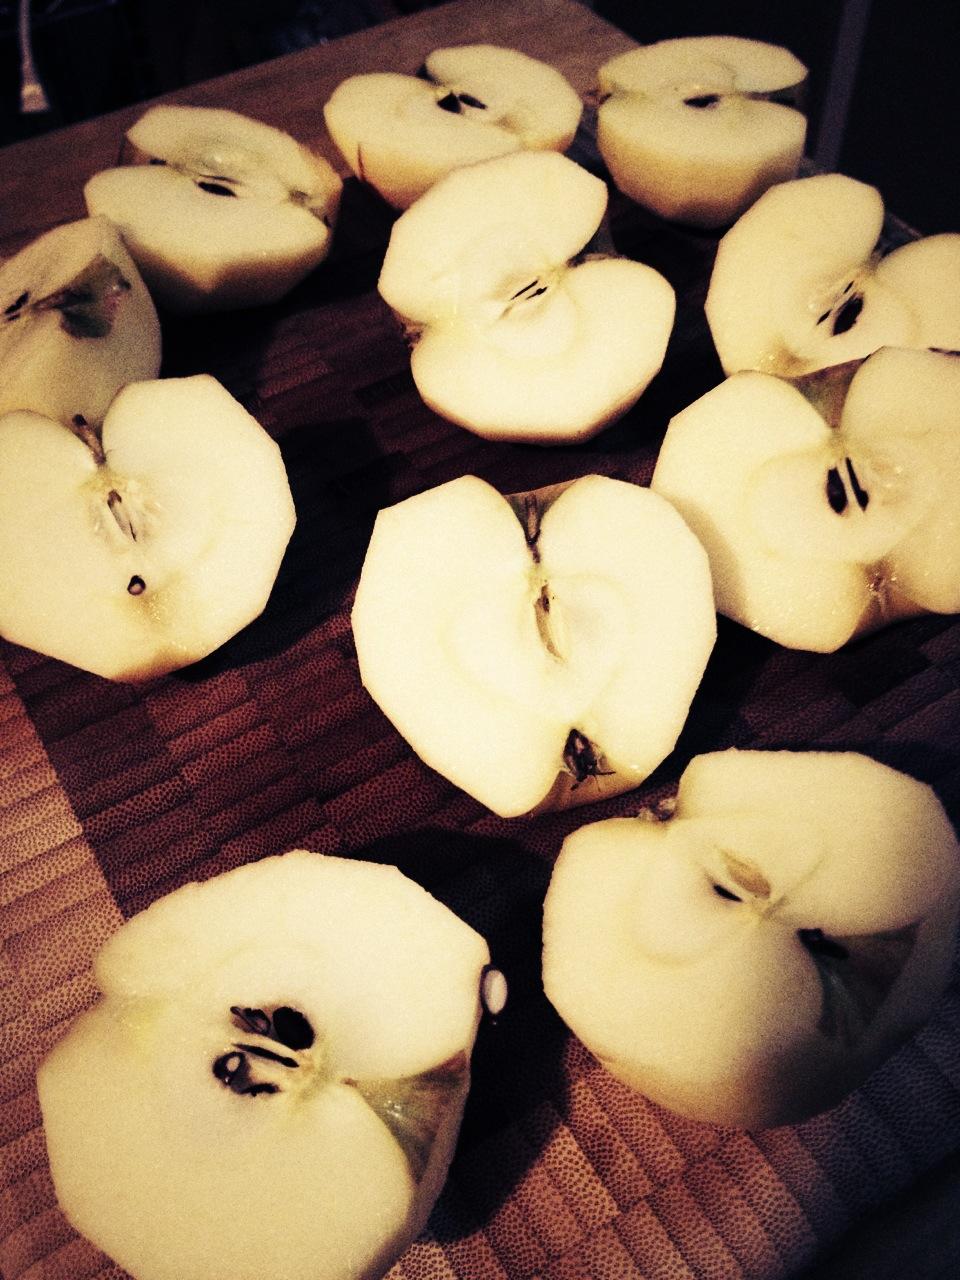 UX, UI and Apple Pie